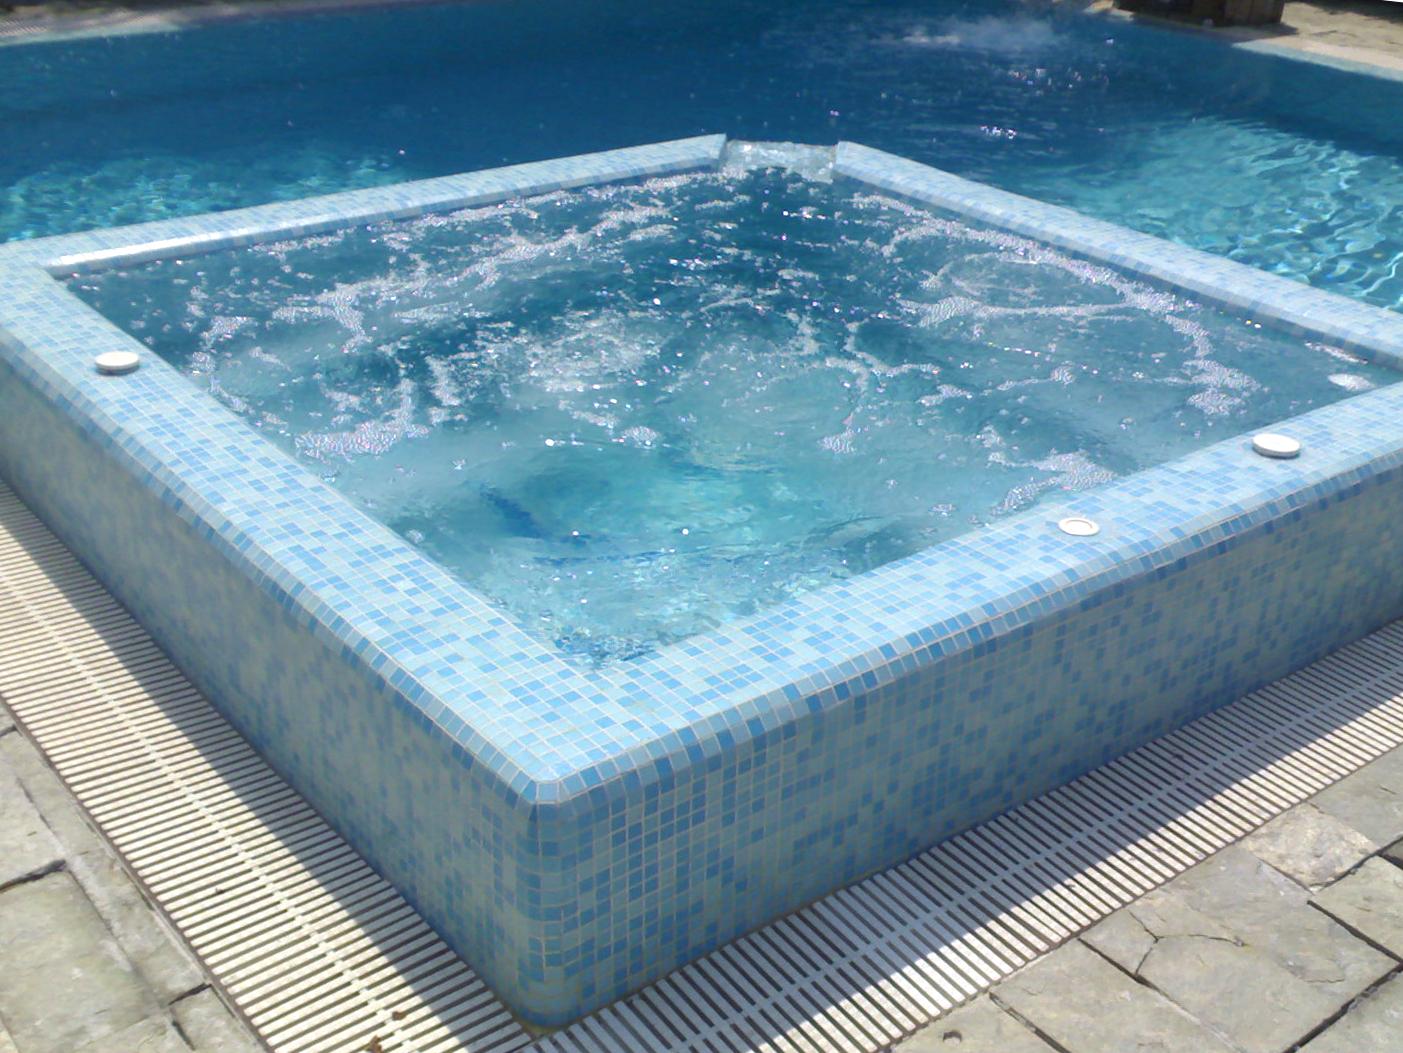 Piscine saune e vasche idromassaggio perpool - Scalda acqua per piscina ...